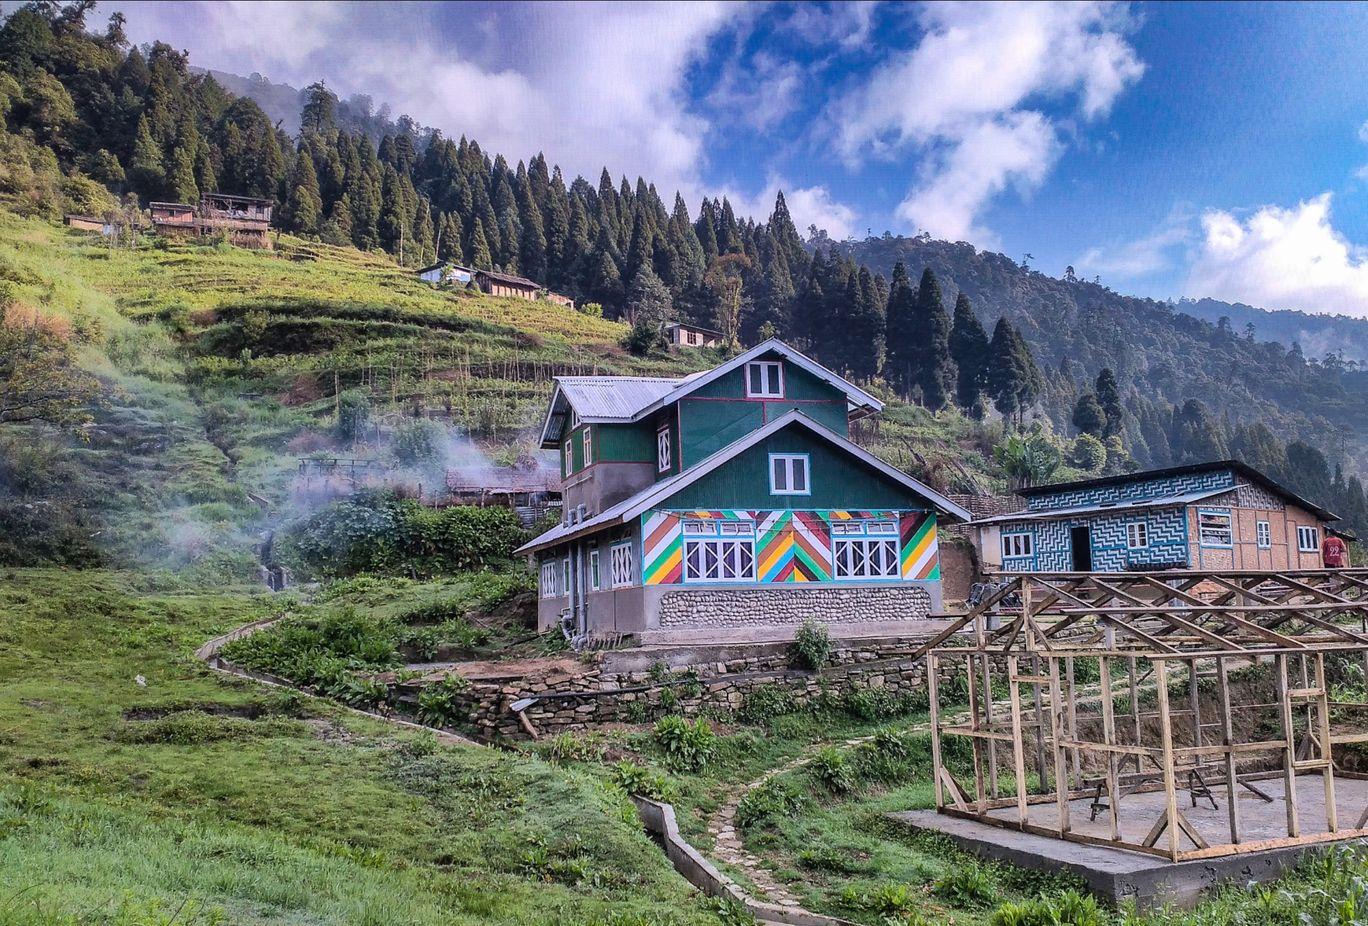 Photo of Gorkhey By Suman Pakhira